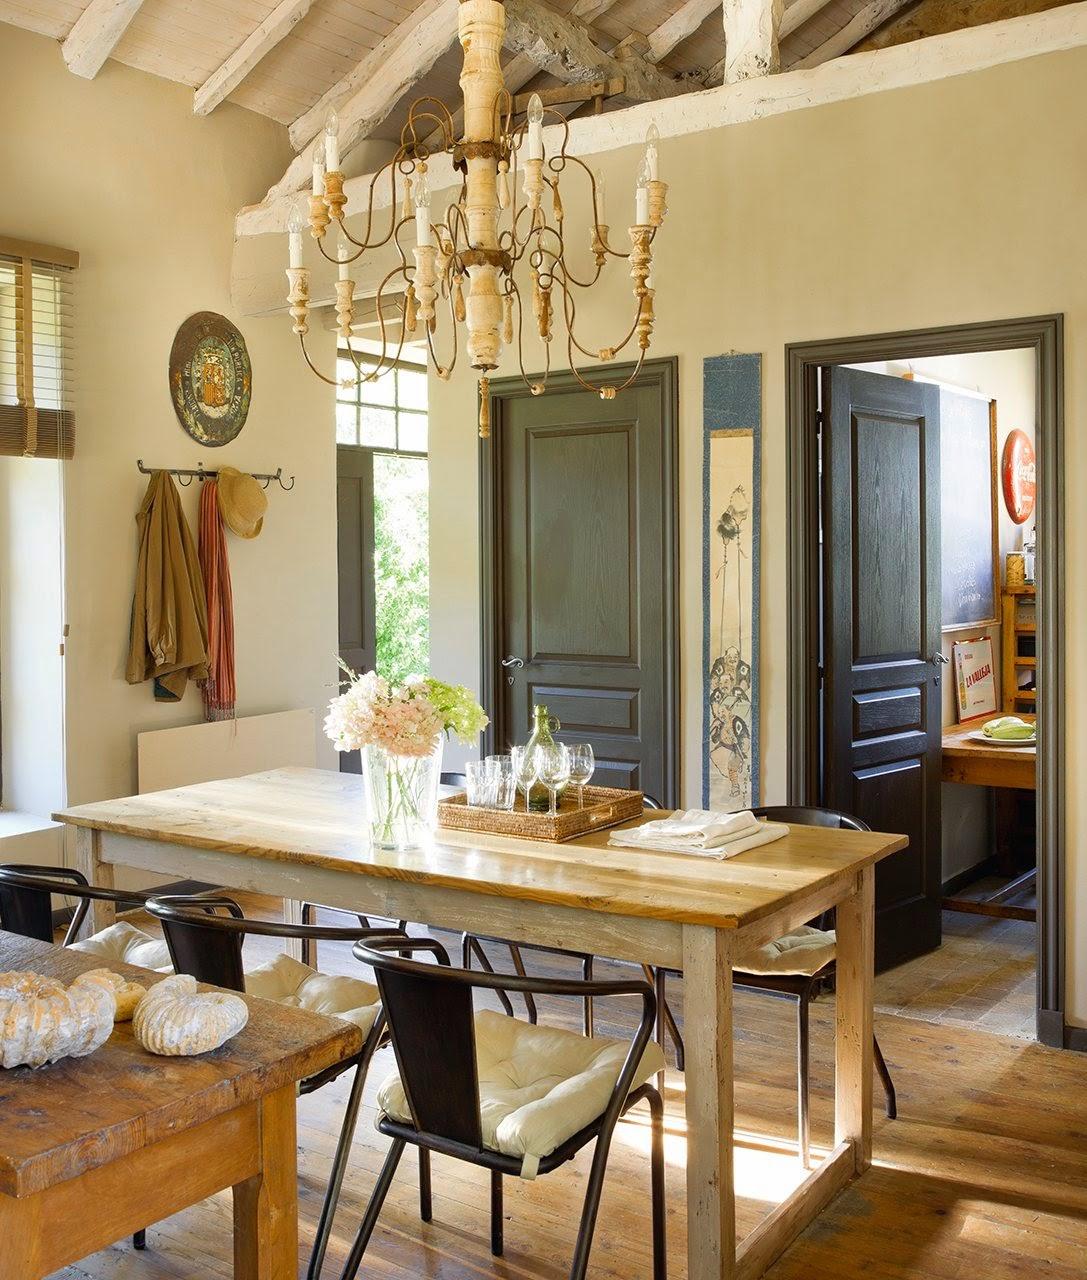 amenajari, interioare, decoratiuni, decor, design interior, stil rustic, reconversie, zid de piatra, sufragerie